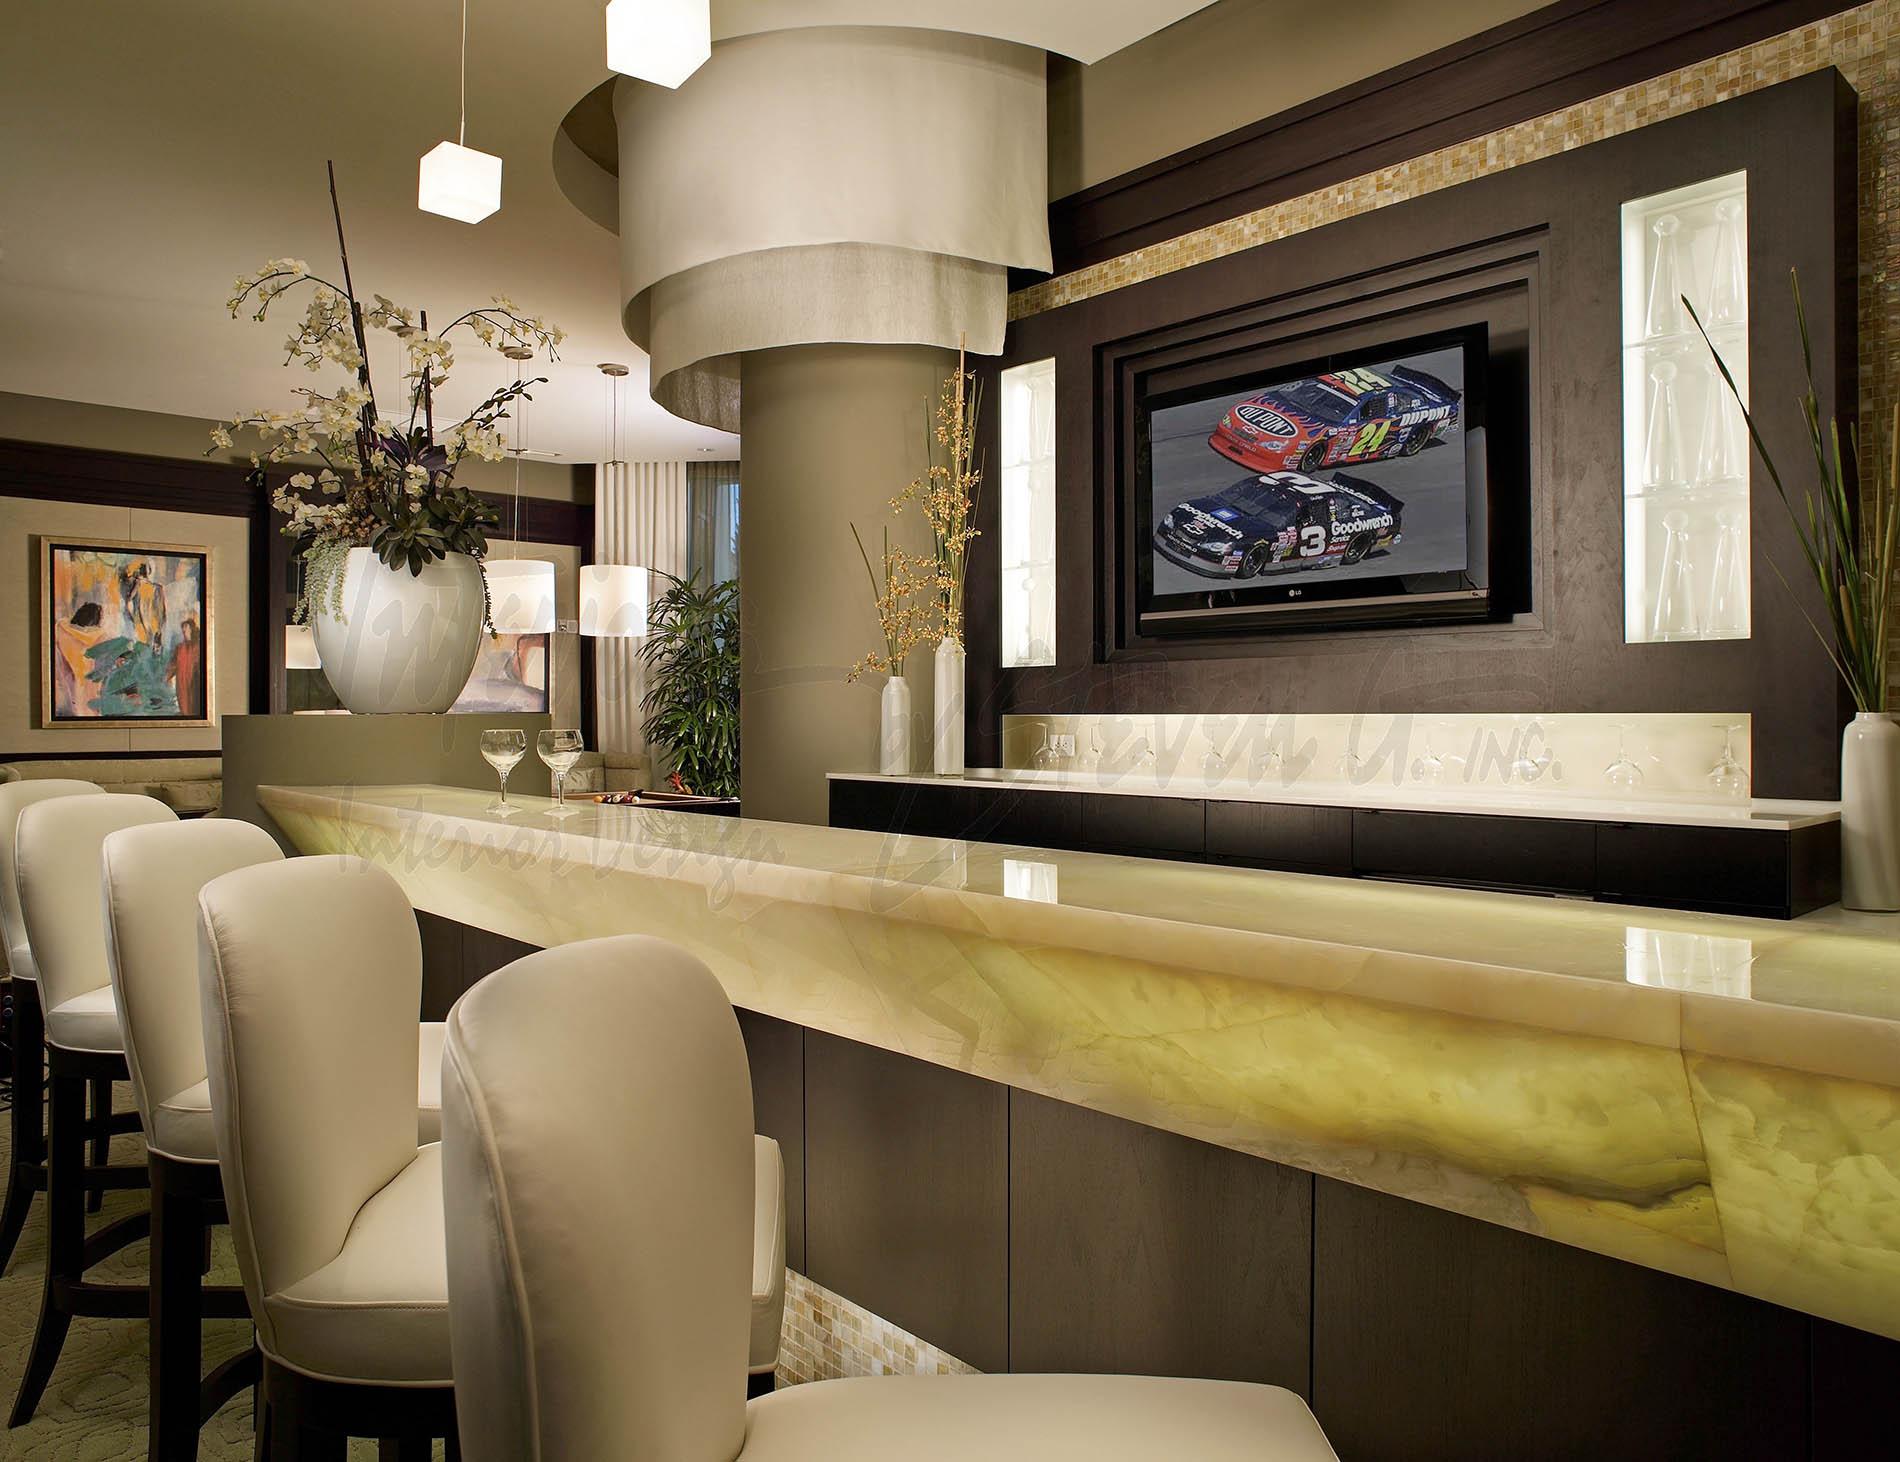 Ritz carlton residences designs interiors by steven g for Steven g interior designs